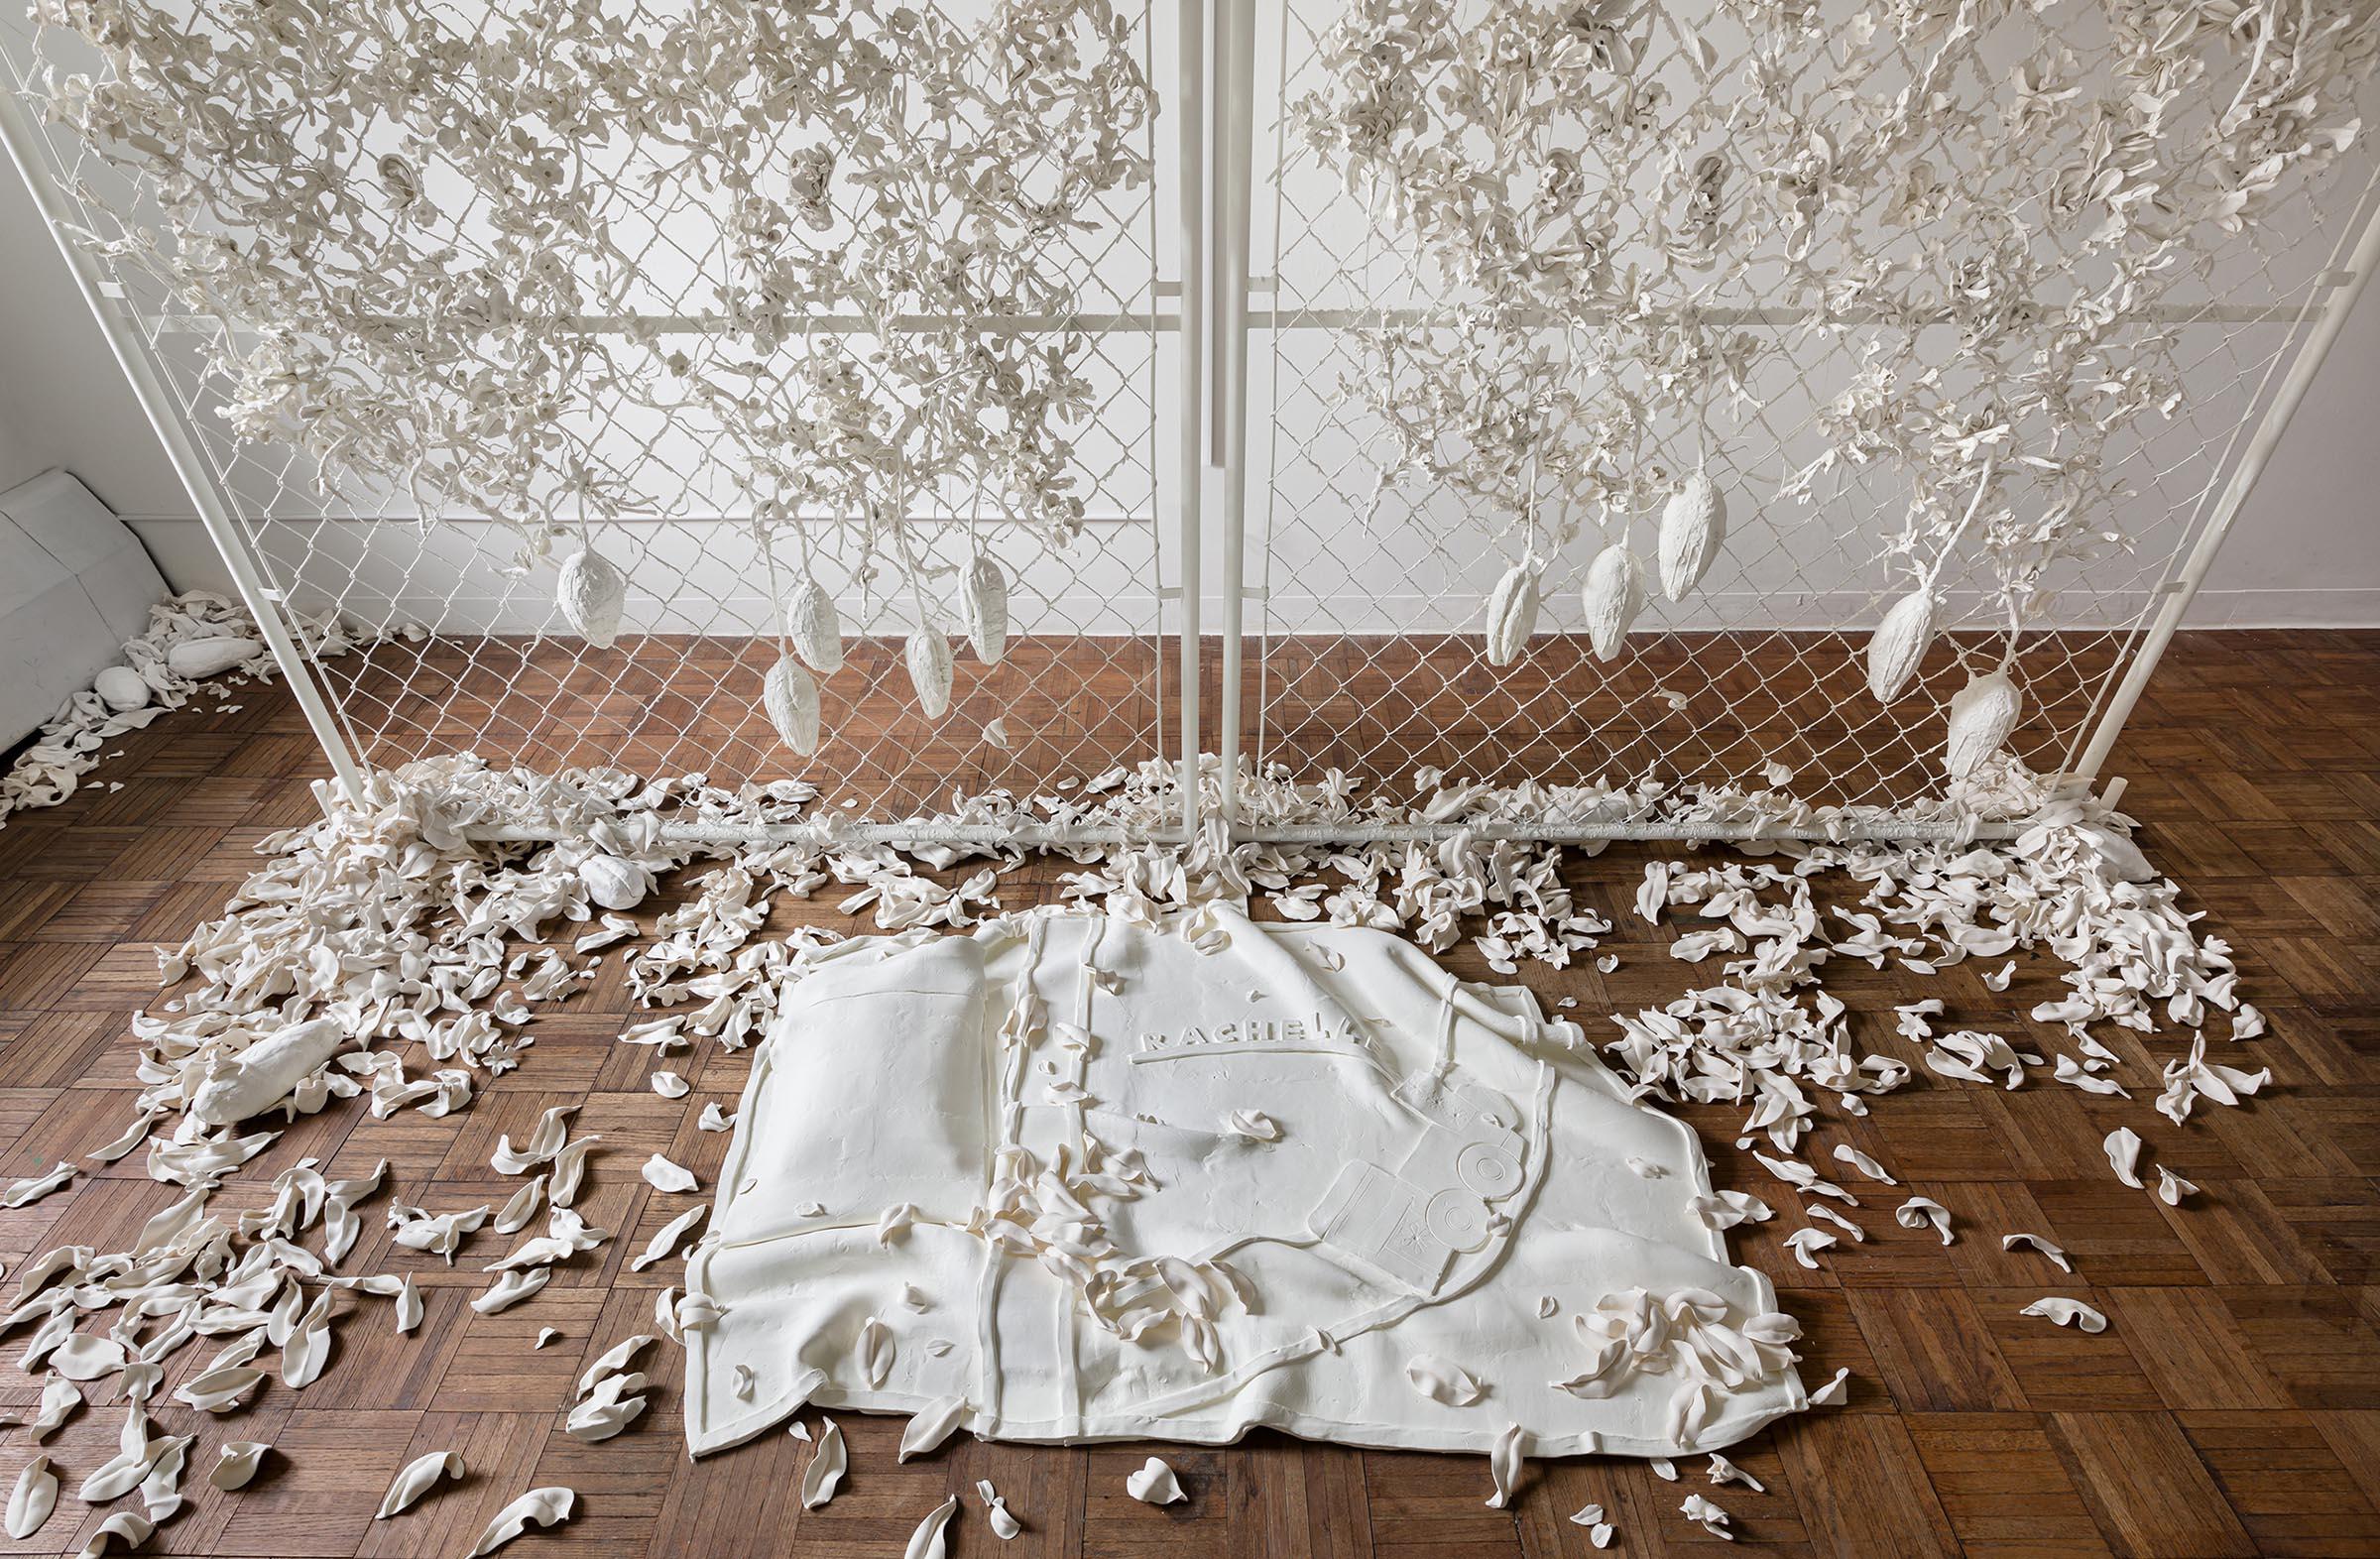 Rachelle Dang sculptural installation at MH Project